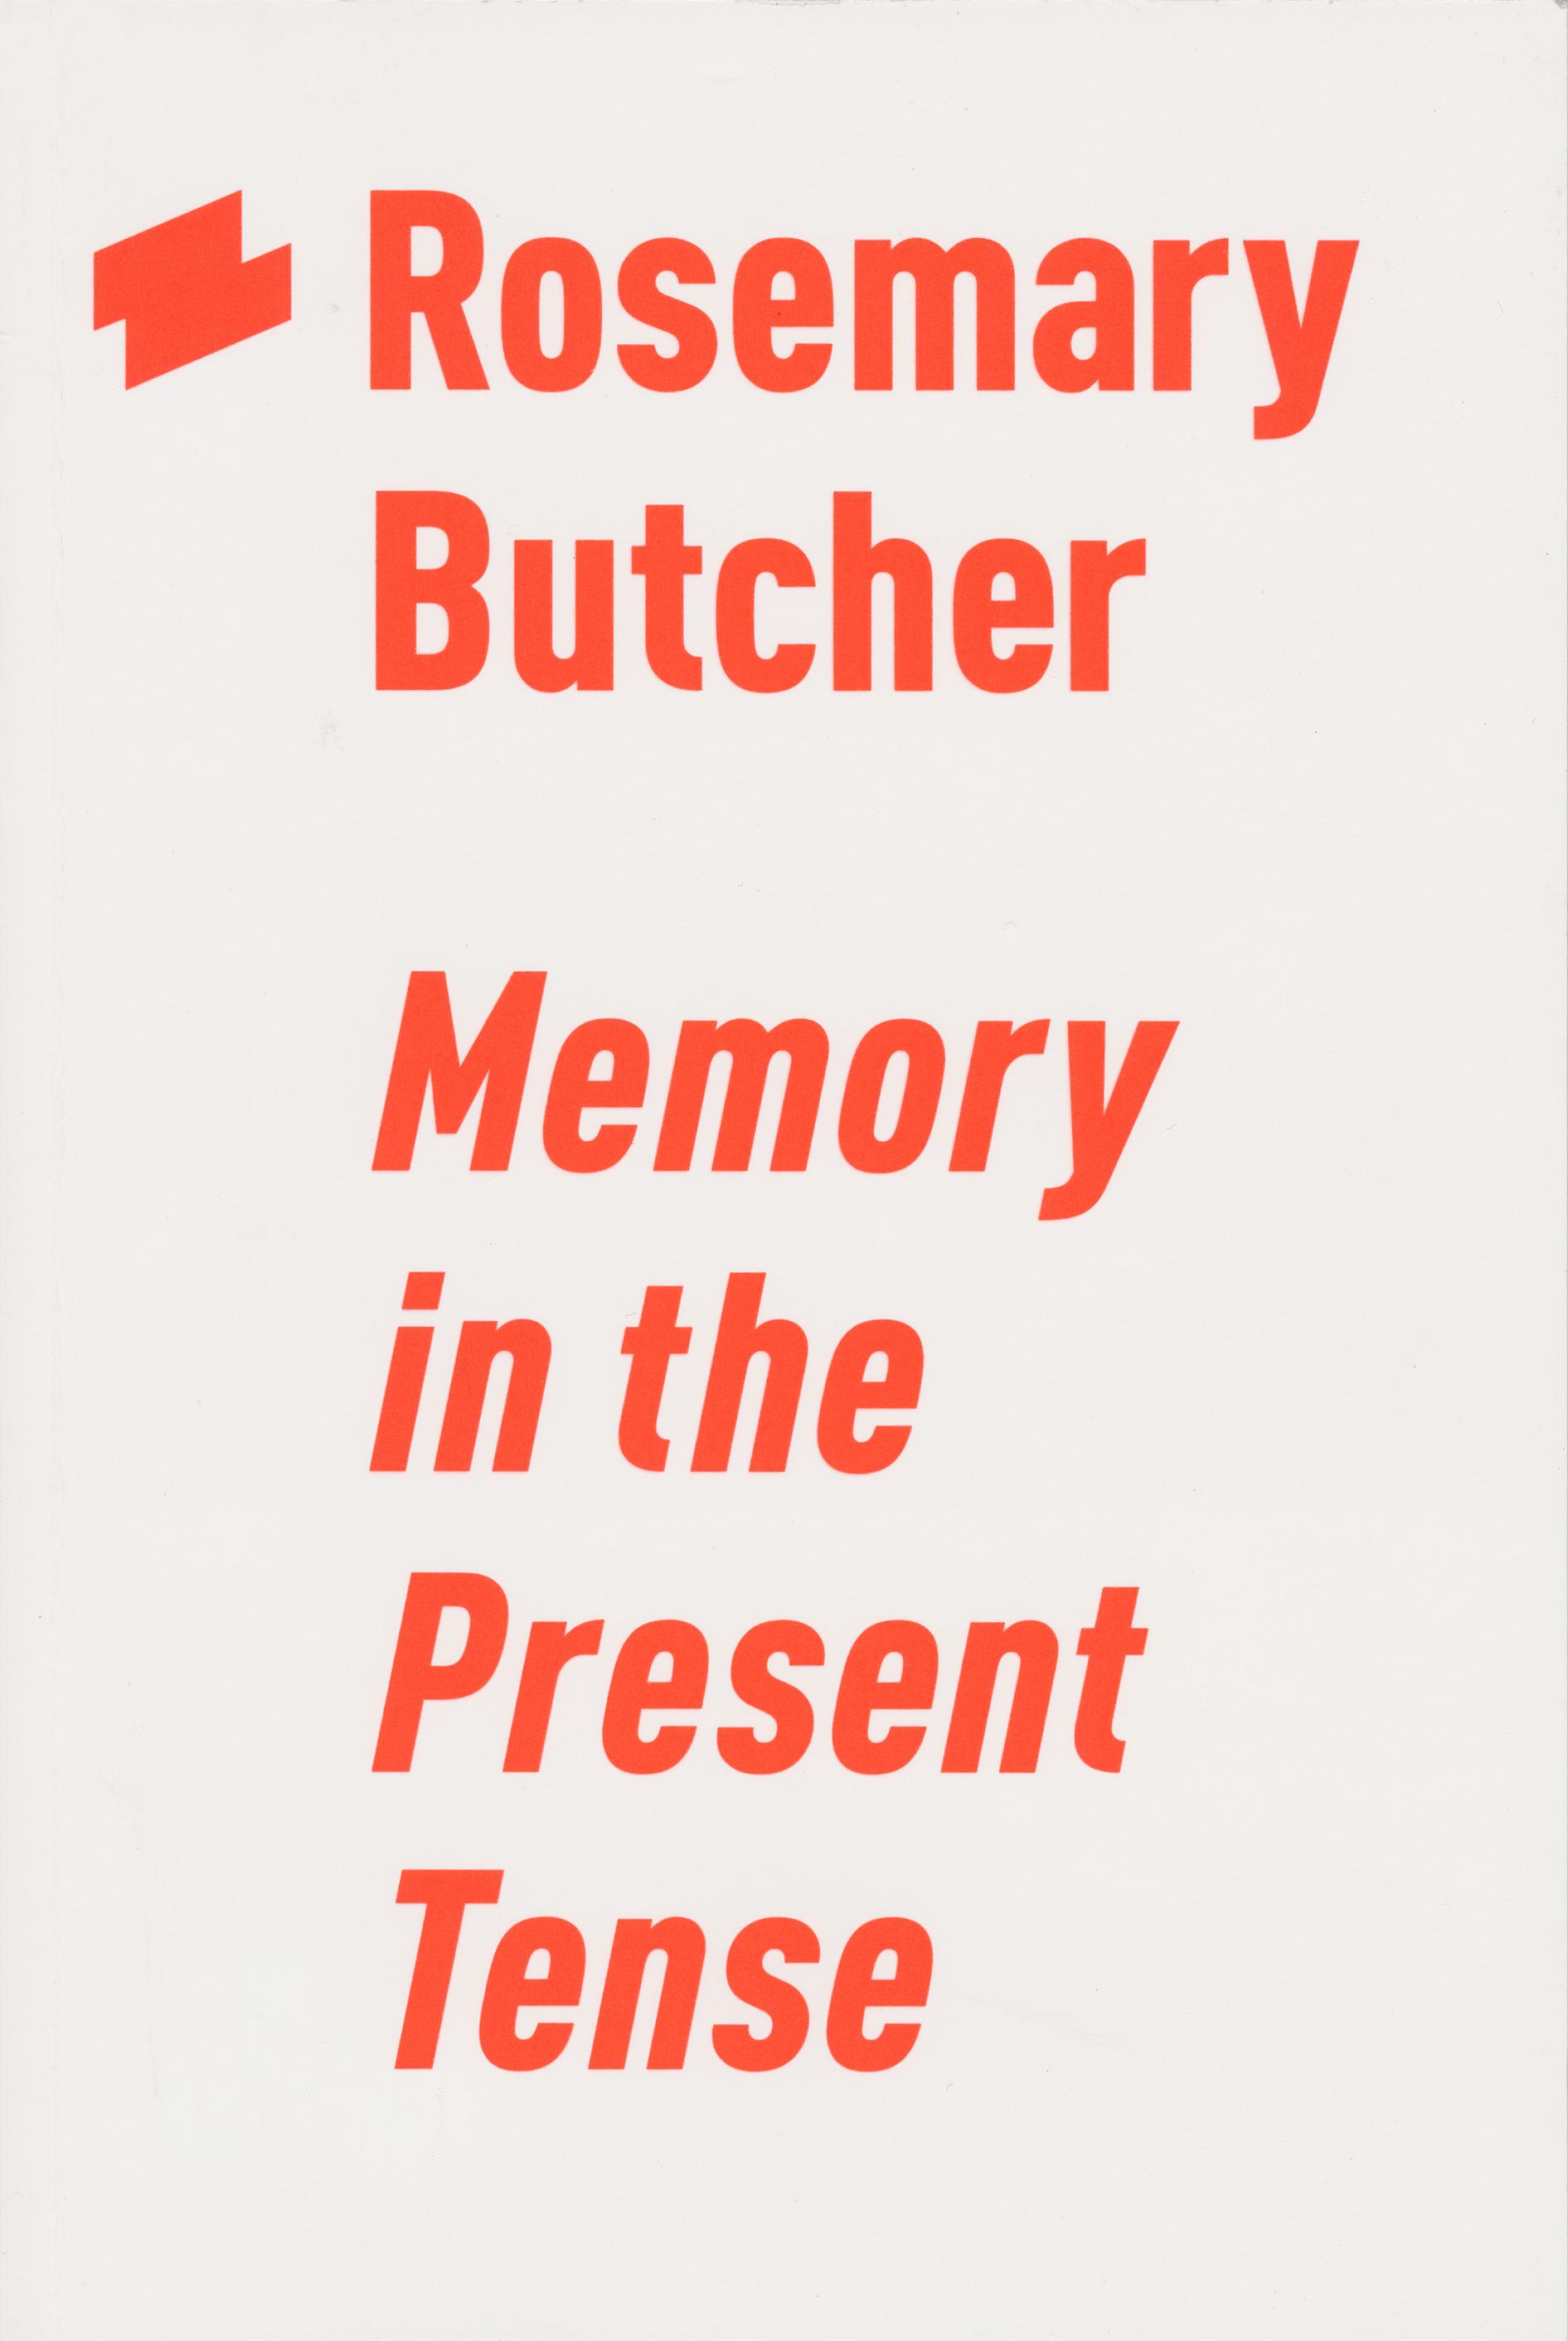 Rosemary_Butcher_Memory_in_the_Present_Tense_HAU_Hebbel_Am_Ufer_2016.jpg